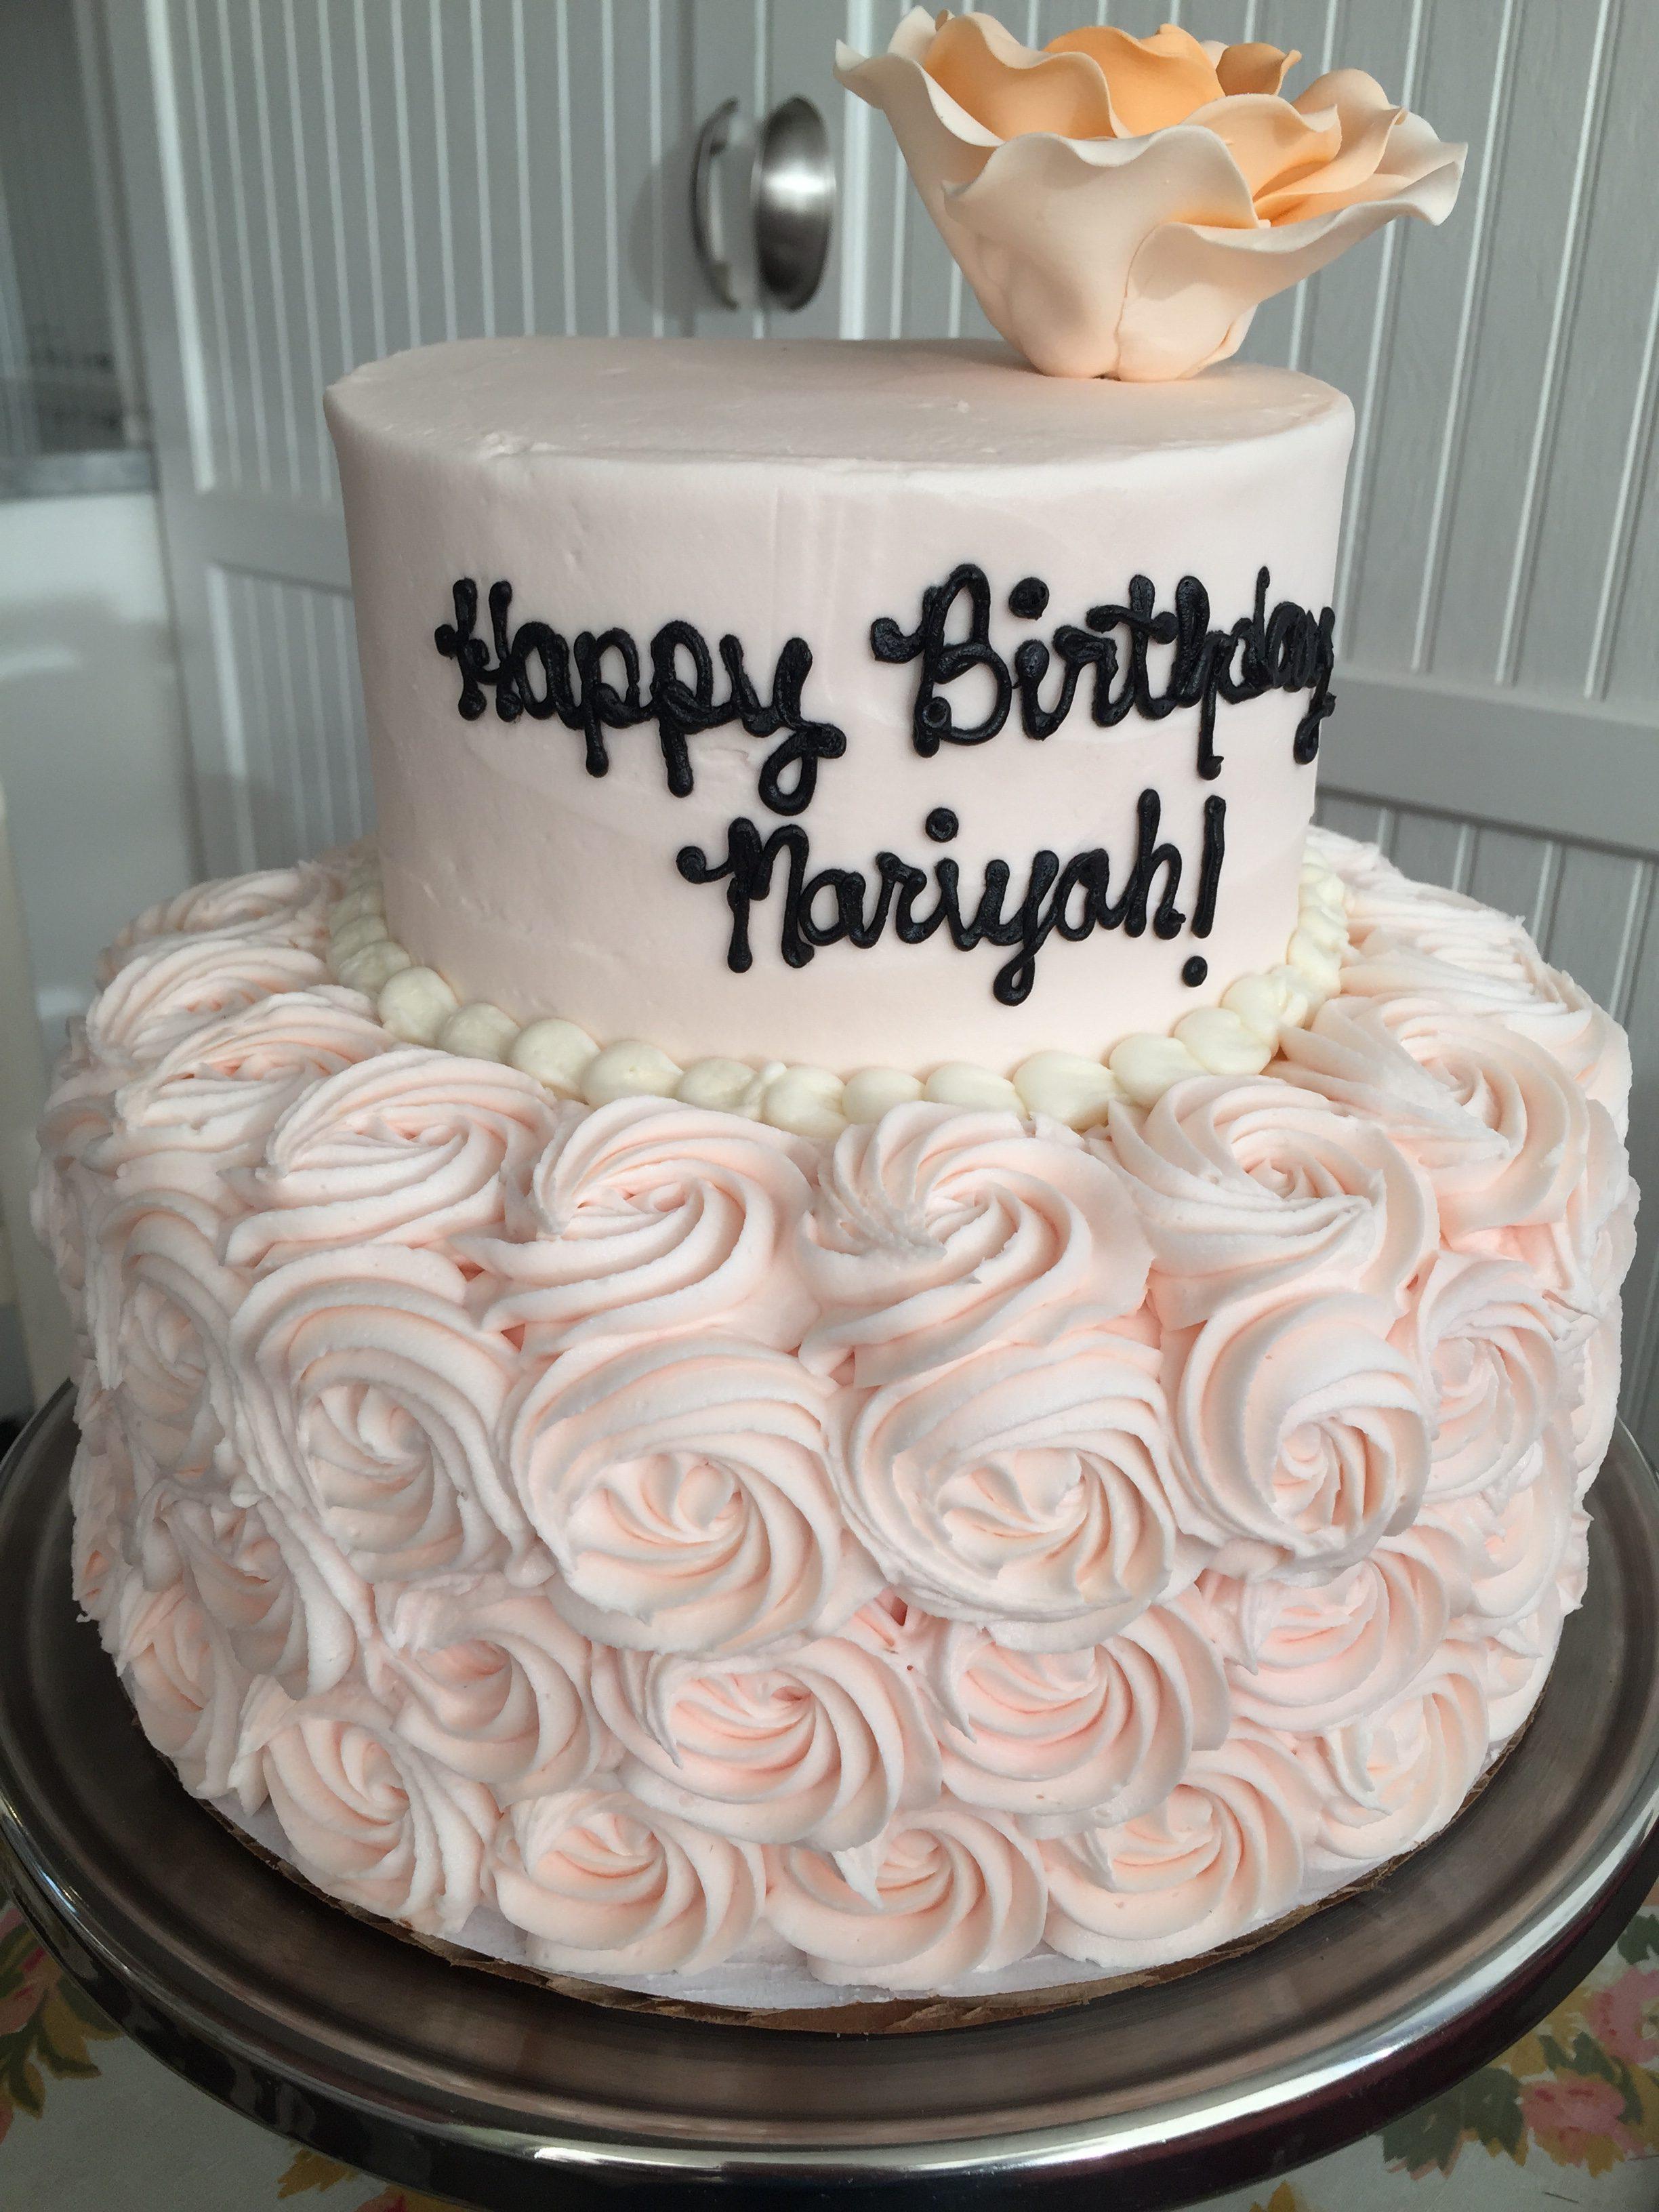 2 Tier Birthday Cakes The Cakeroom Bakery Shop